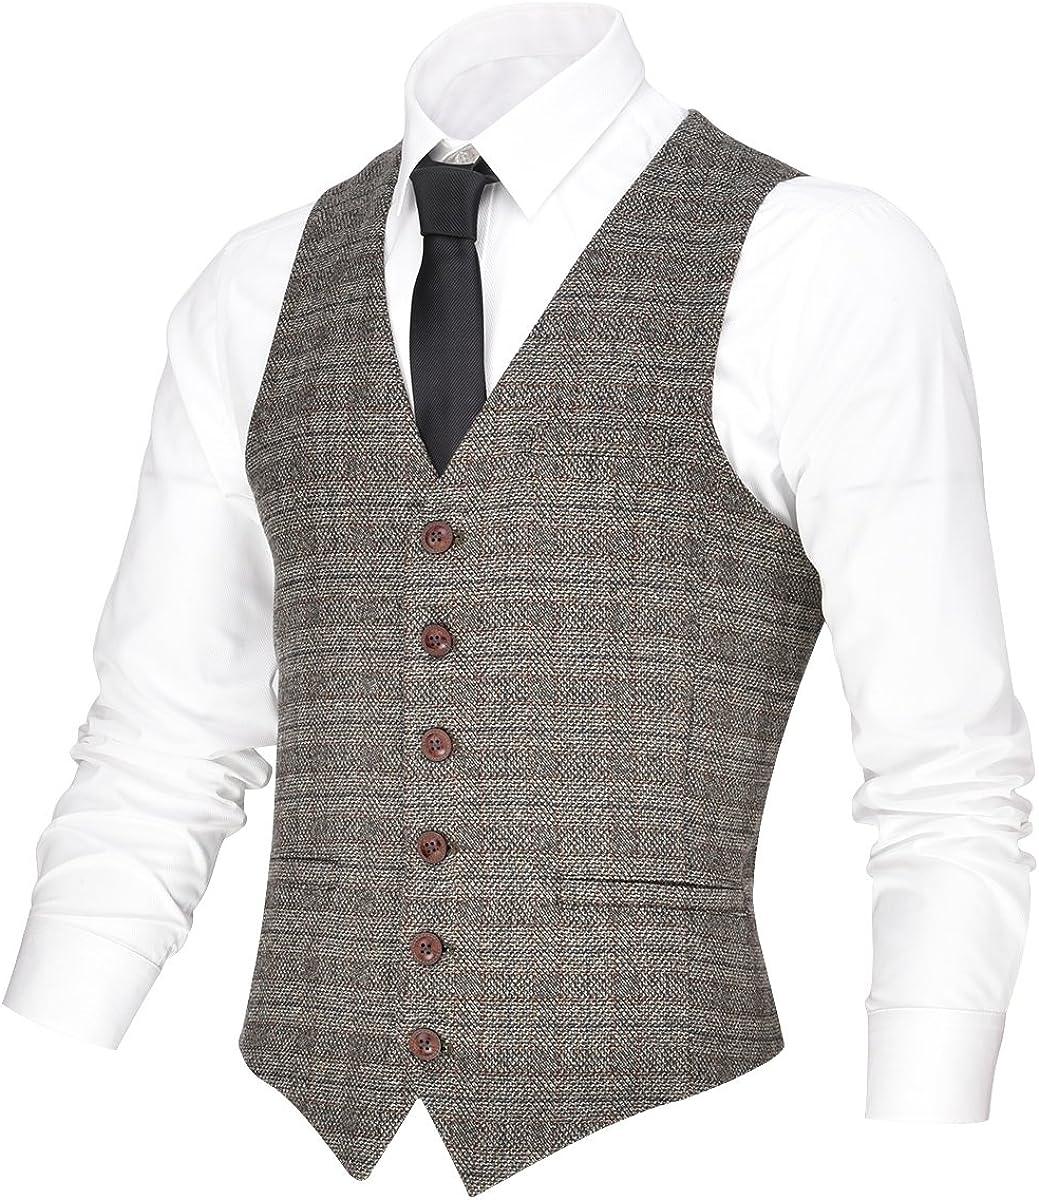 Max 47% OFF VOBOOM Men's V-Neck Suit Vest Casual Ves Button Ranking TOP15 Fit Dress 6 Slim